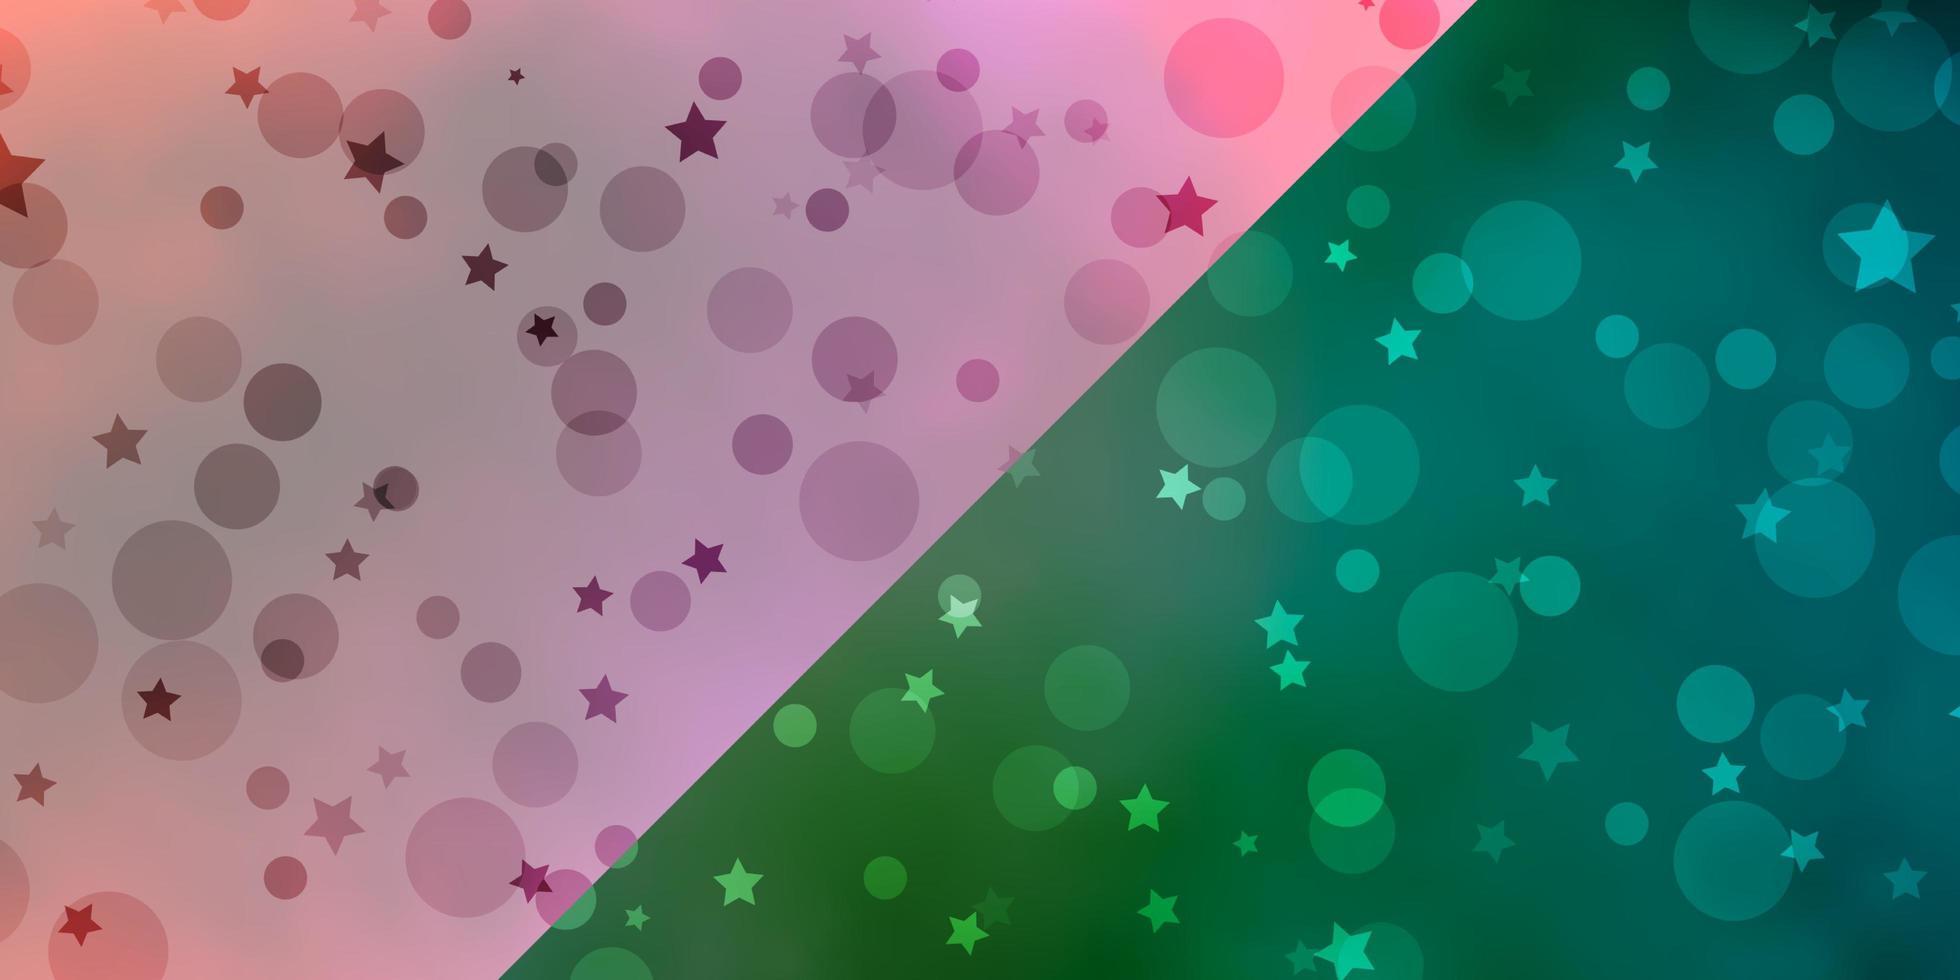 textura com círculos, estrelas. vetor